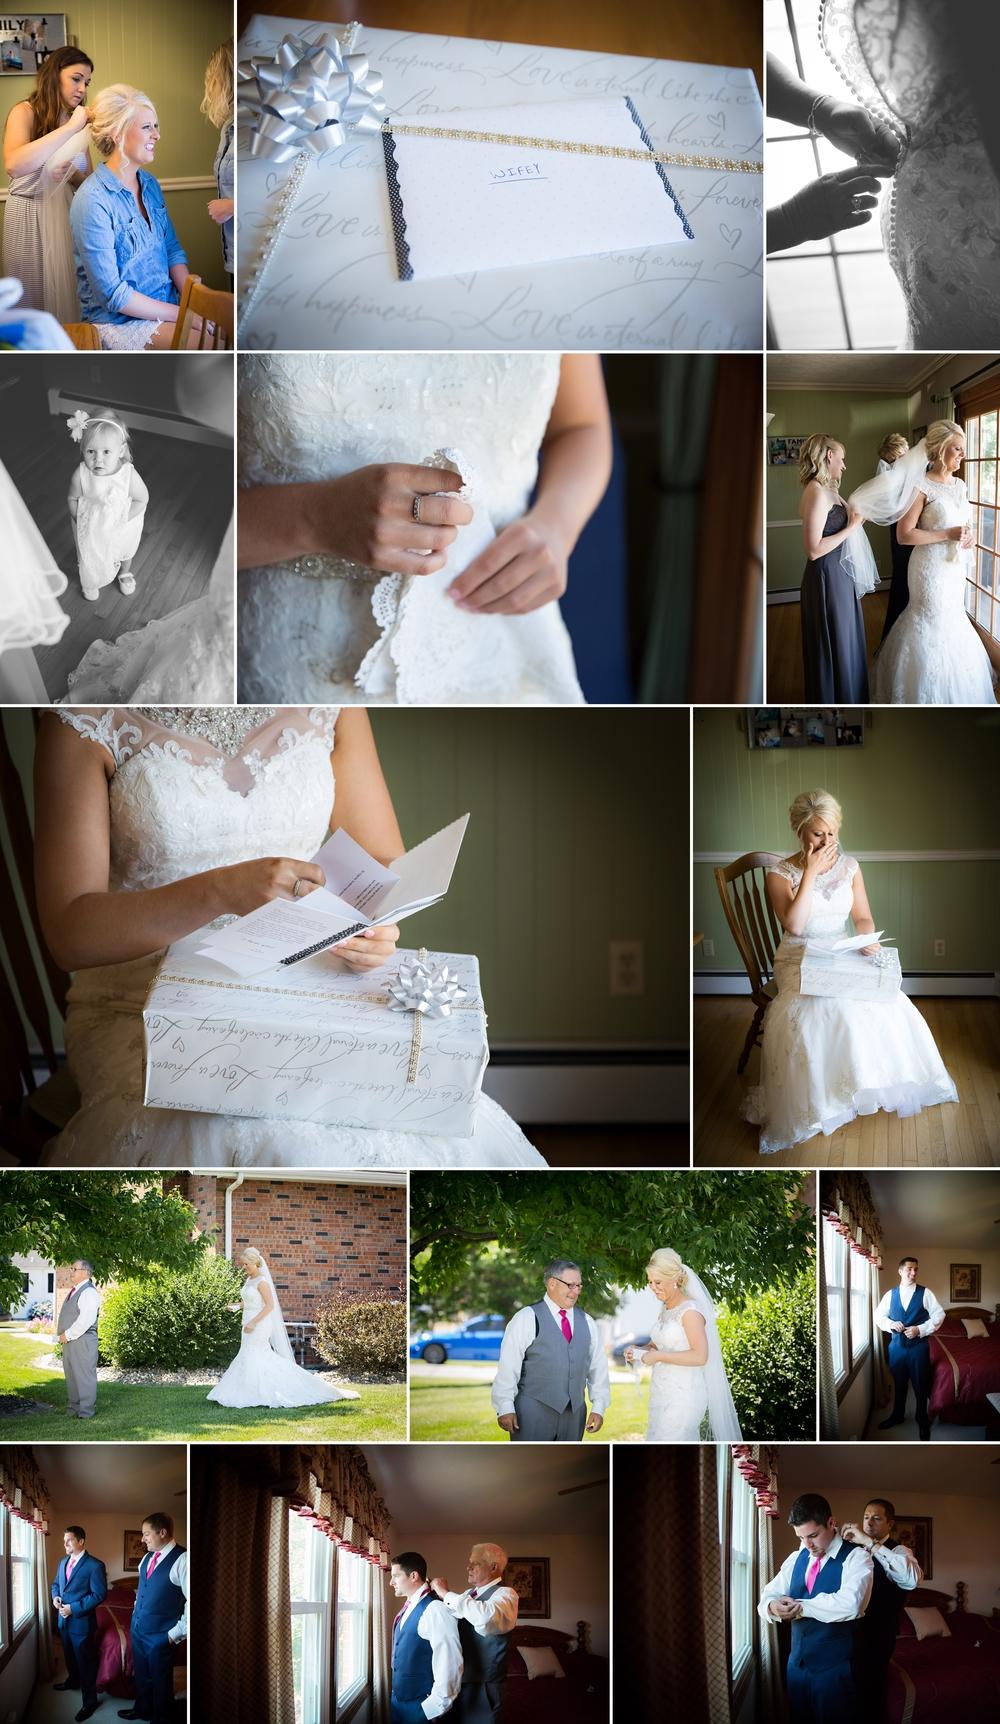 Kuhn wedding 2.jpg